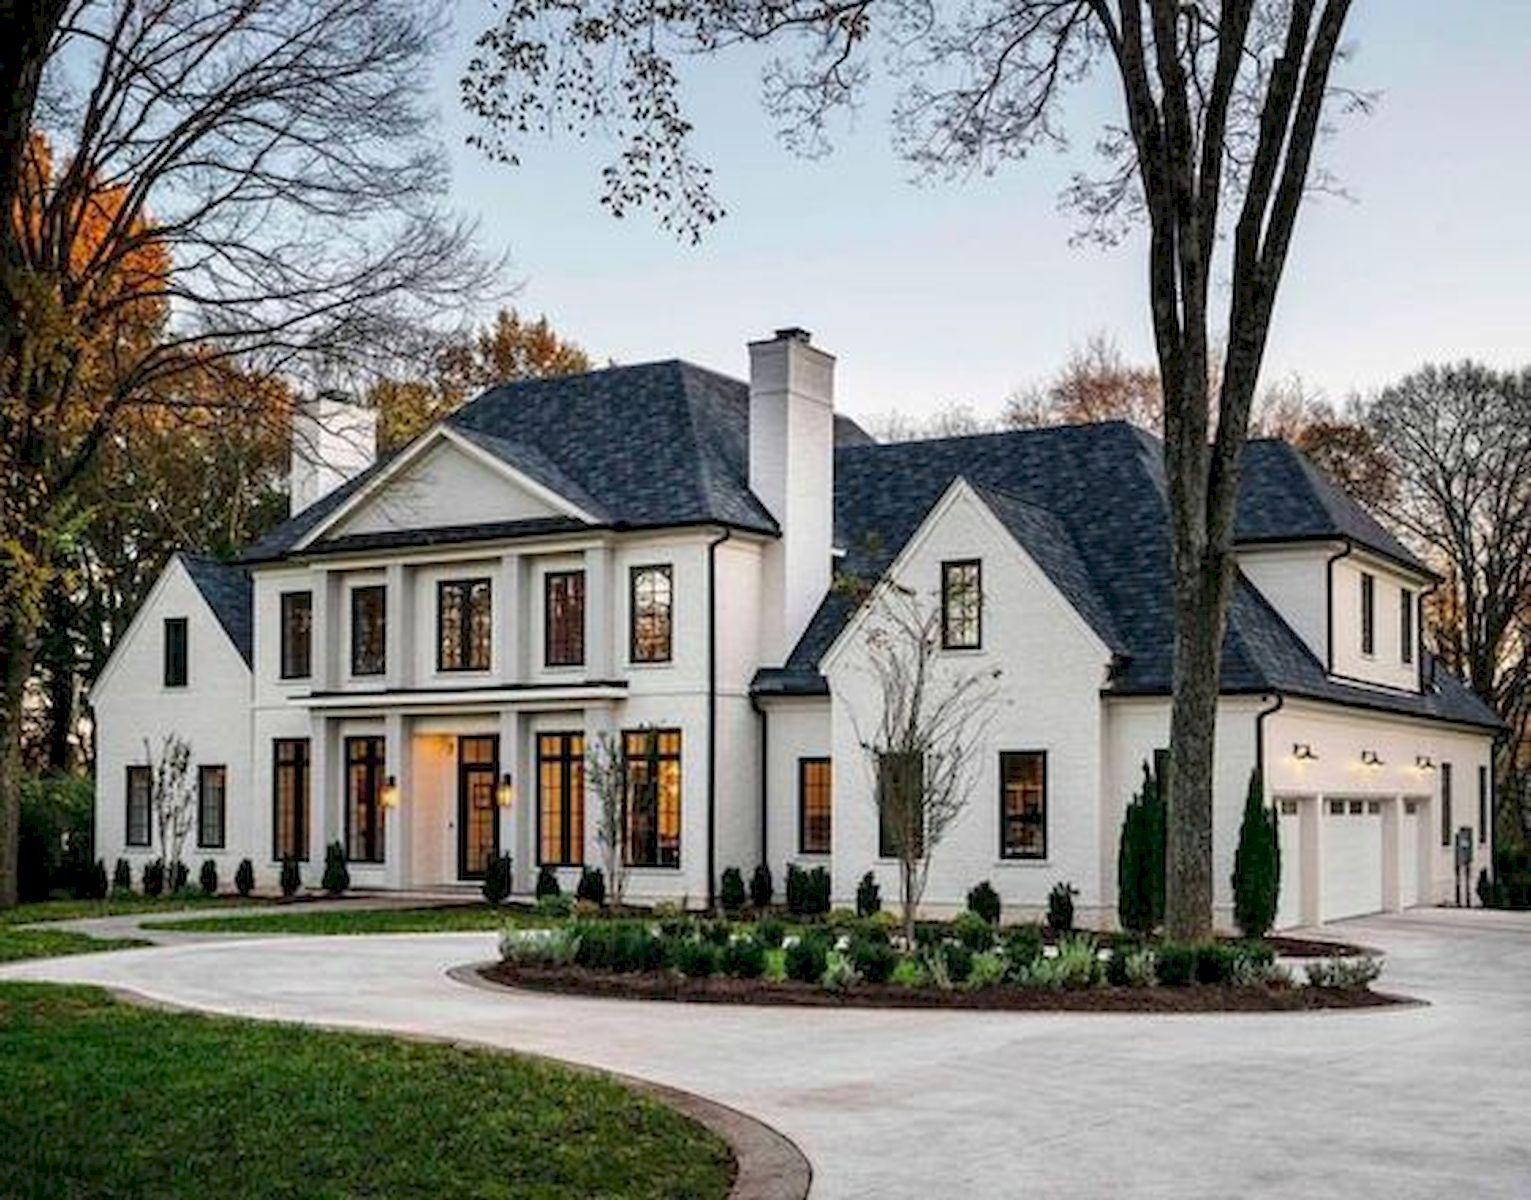 Gorgeous 40 Stunning Mansions Luxury Exterior Design Ideas Https Livingmarch Com 40 Stunning Mansi House Designs Exterior Dream House Exterior House Exterior